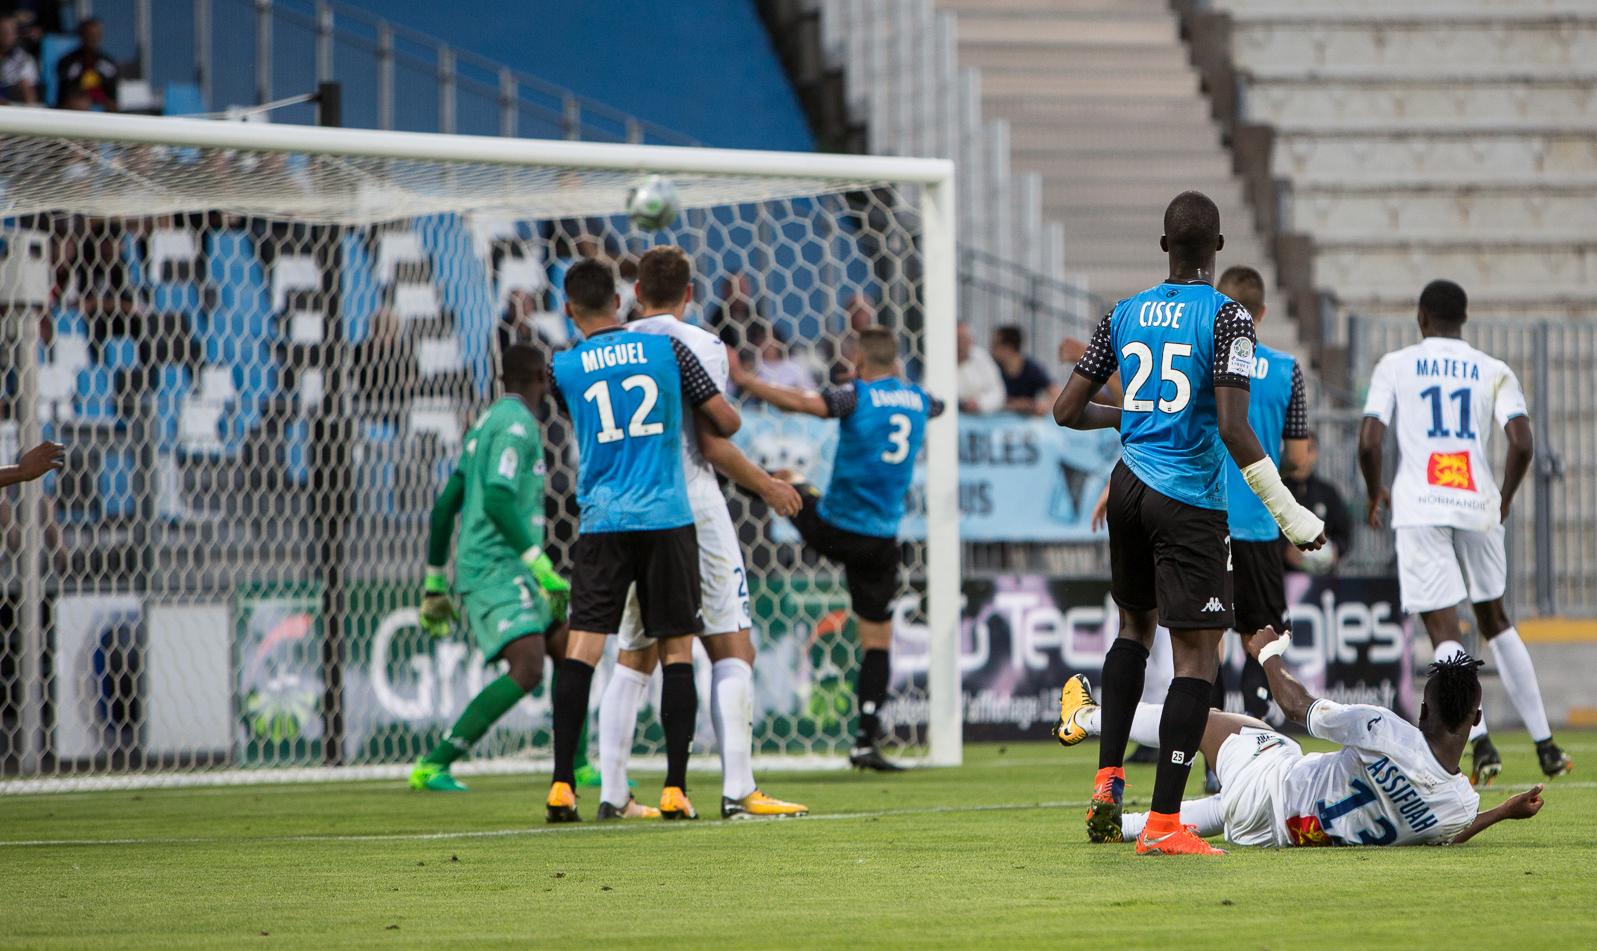 Pronostico Rodez-Le Havre 29 novembre: quote di Ligue 2